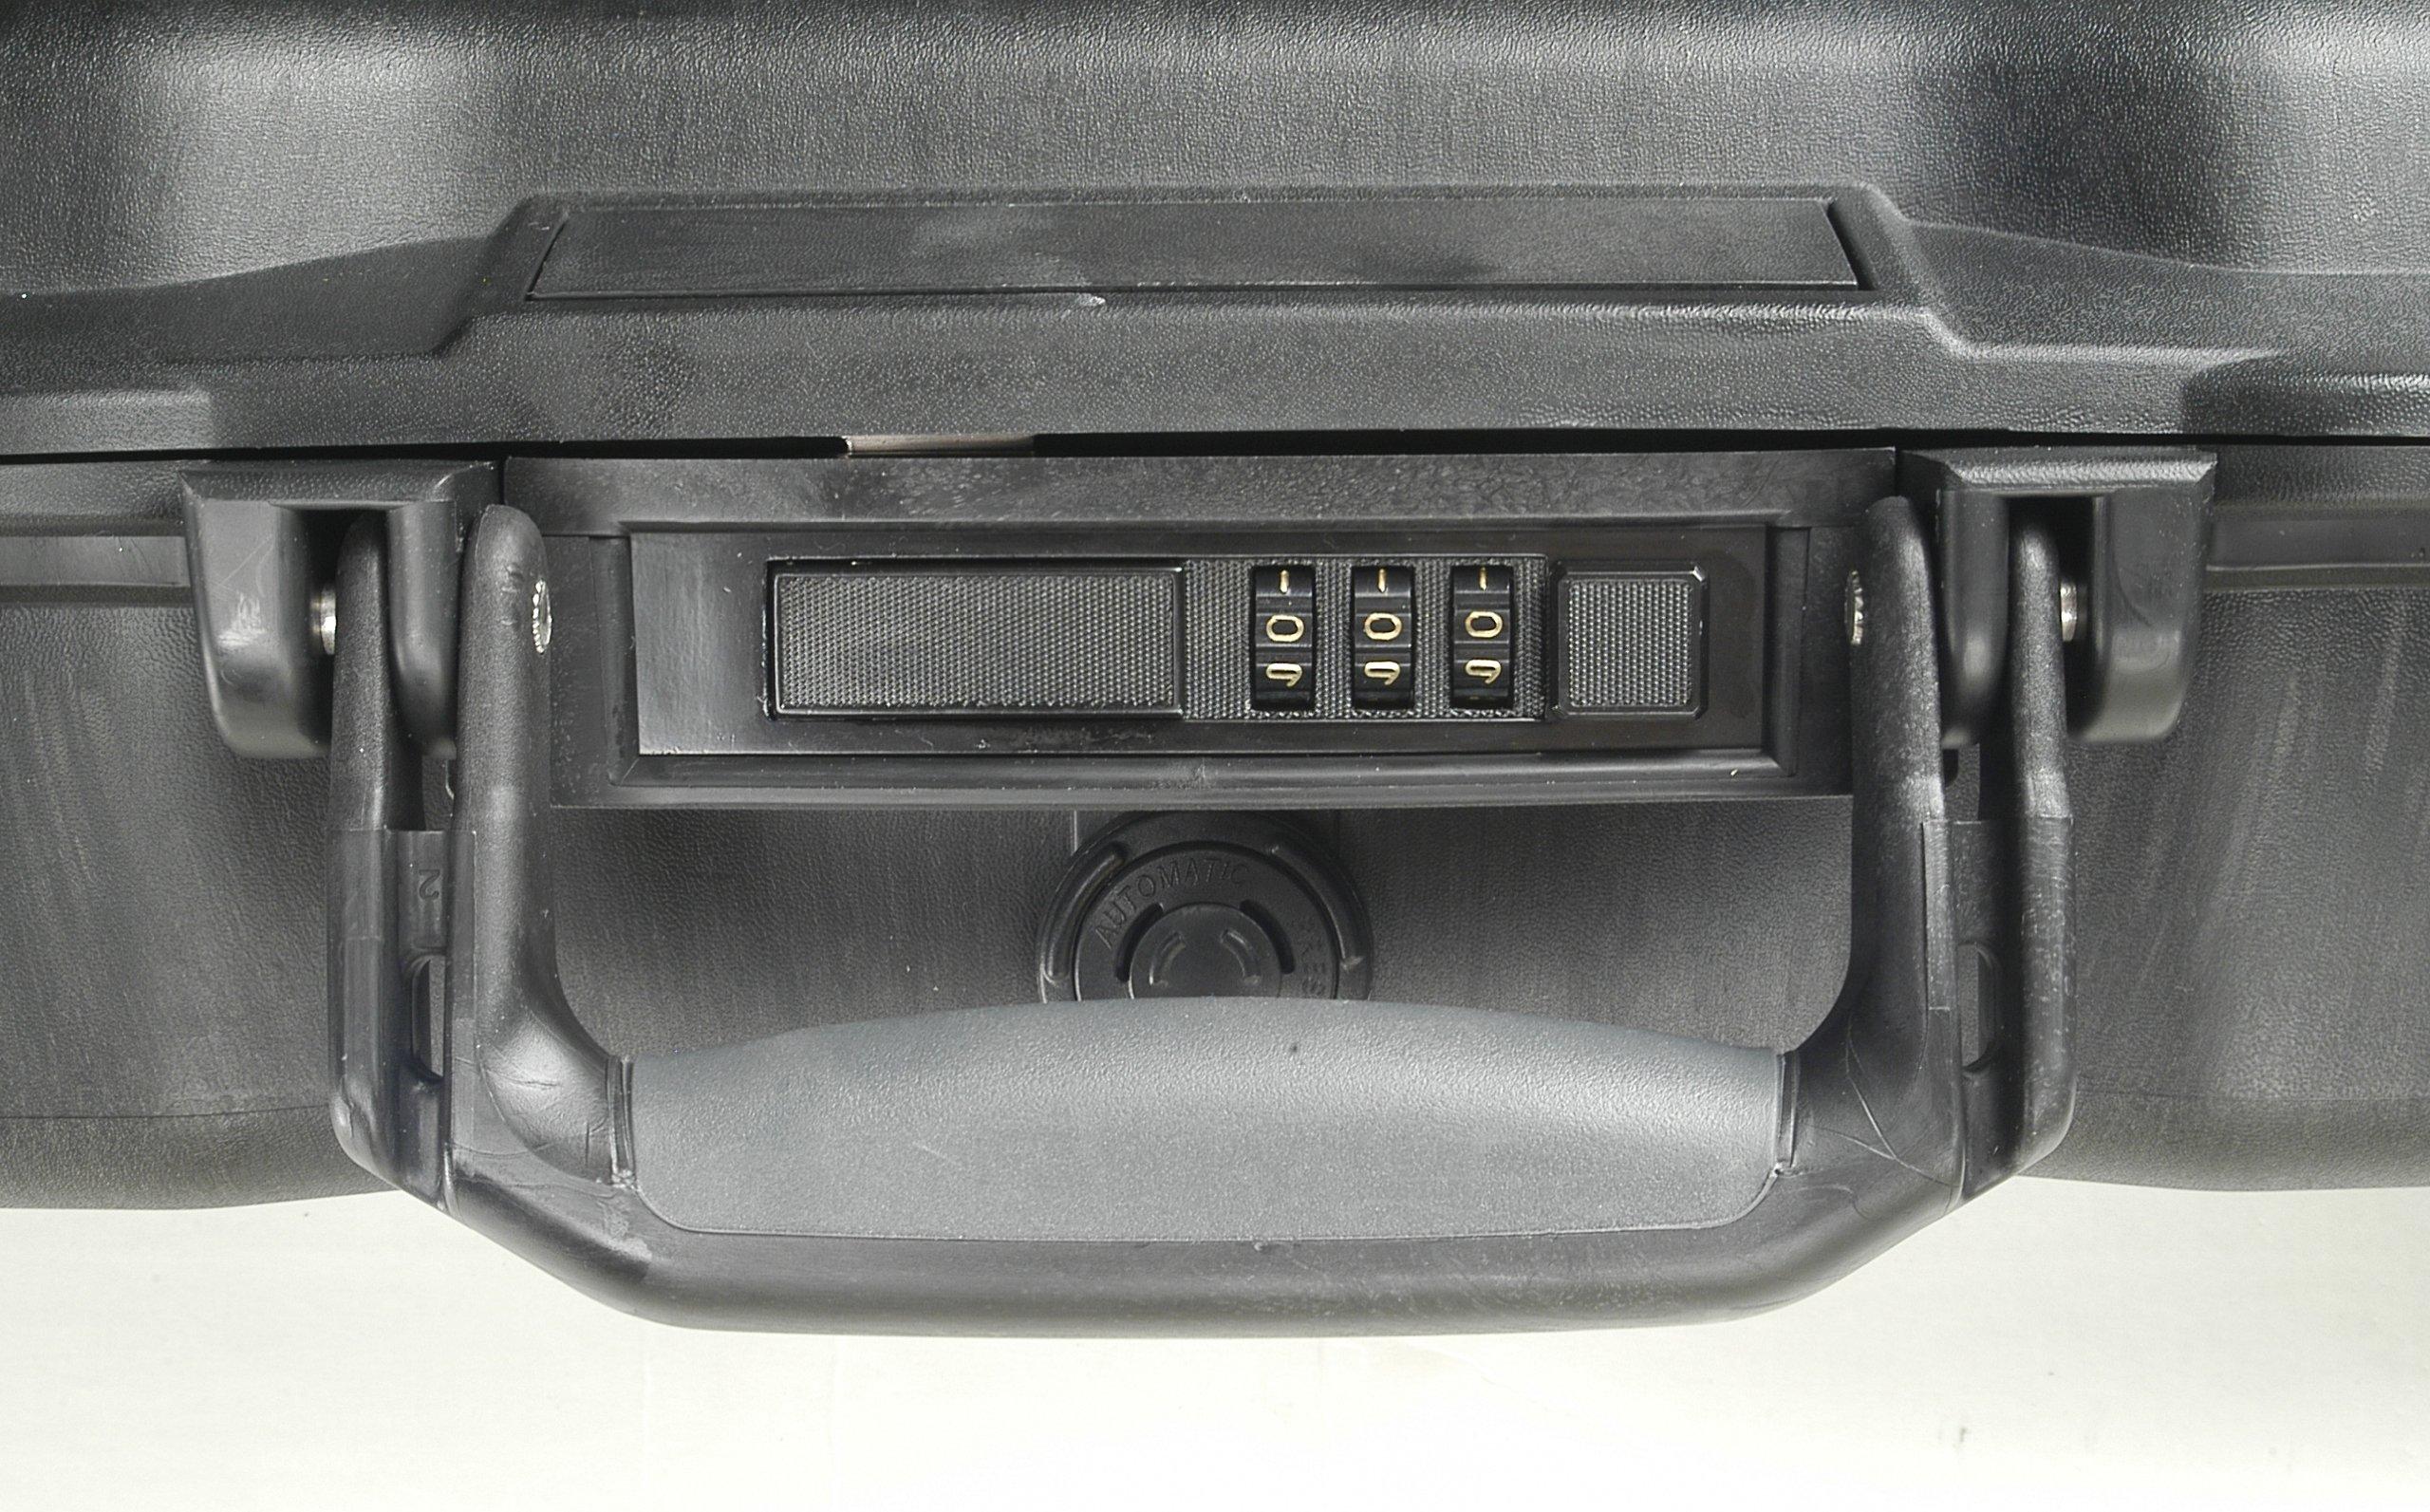 PELICAN 1495 CC#1 Deluxe Computer Case by Pelican (Image #3)